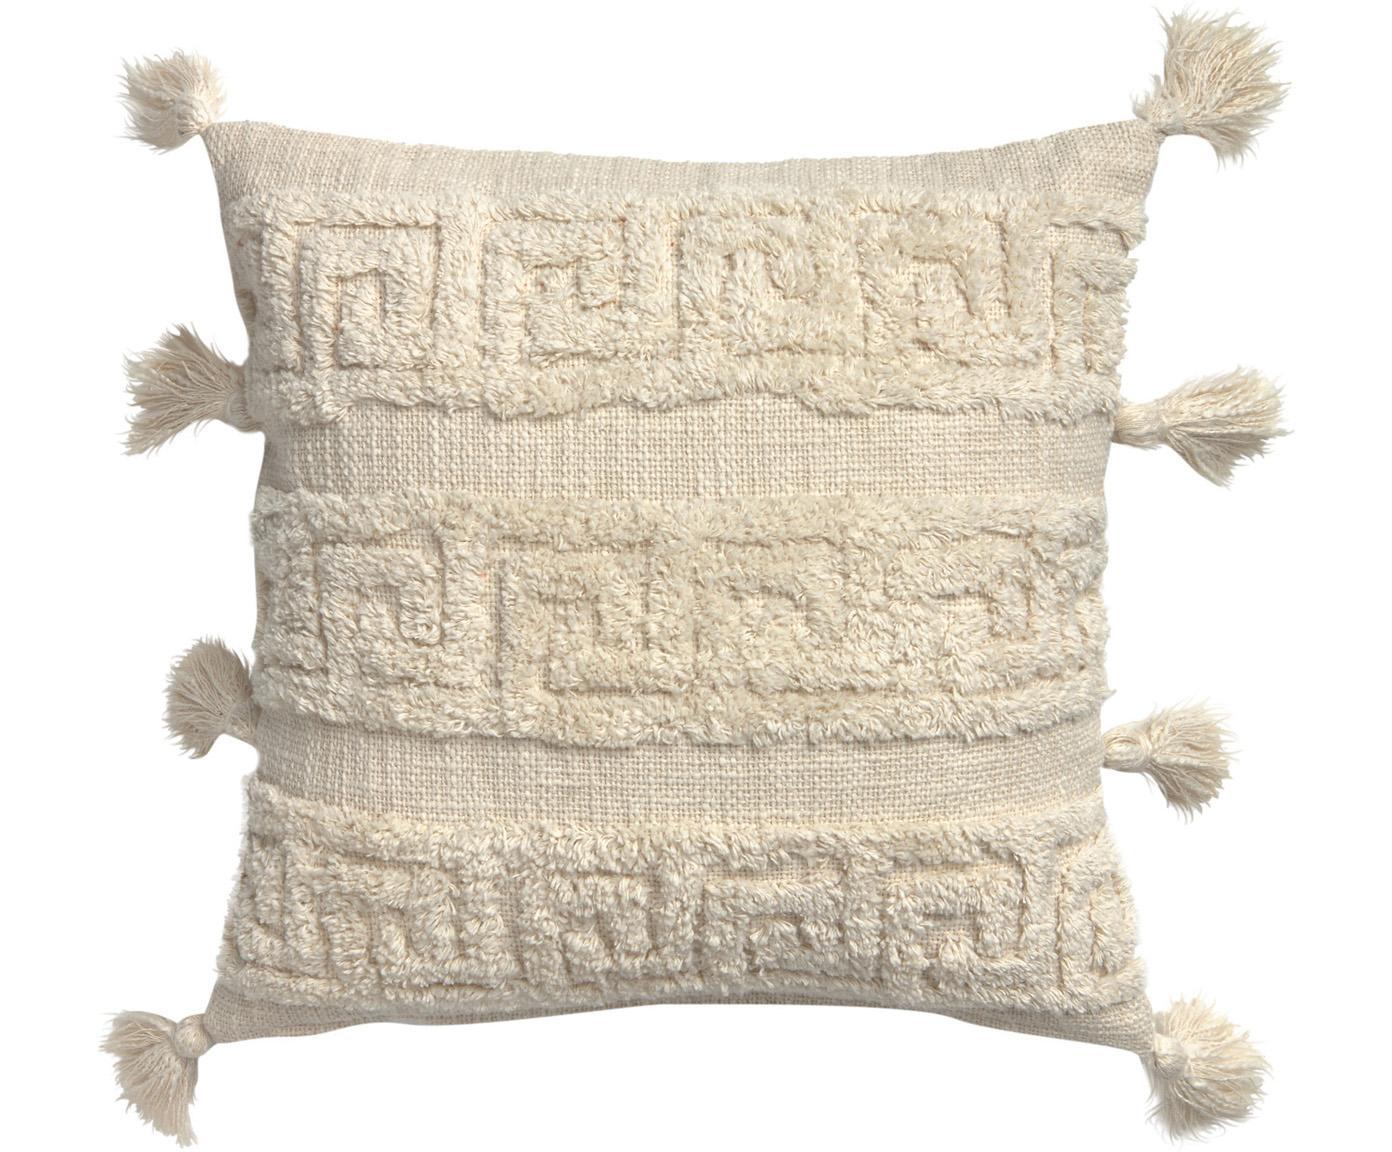 Boho kussenhoes Hera met hoog-laag patroon en kwastjes, 100% katoen, Crèmekleurig, 45 x 45 cm